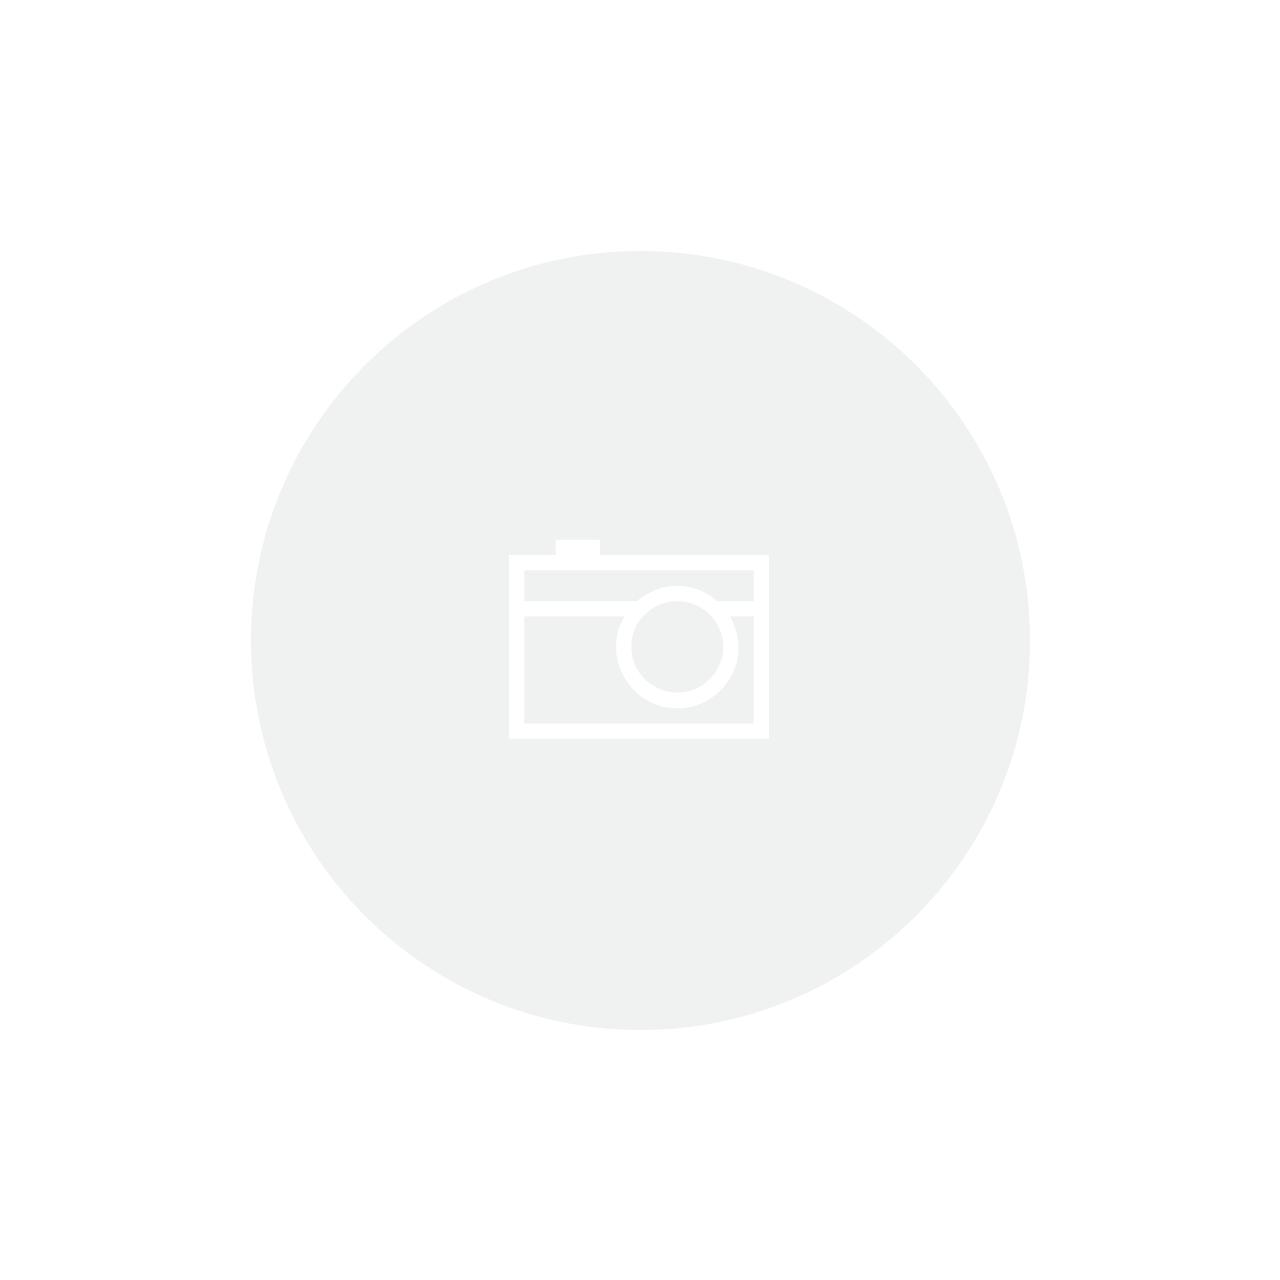 FAROL LED H-1366 4F MINI RECARREGÁVEL 300 LUMENS